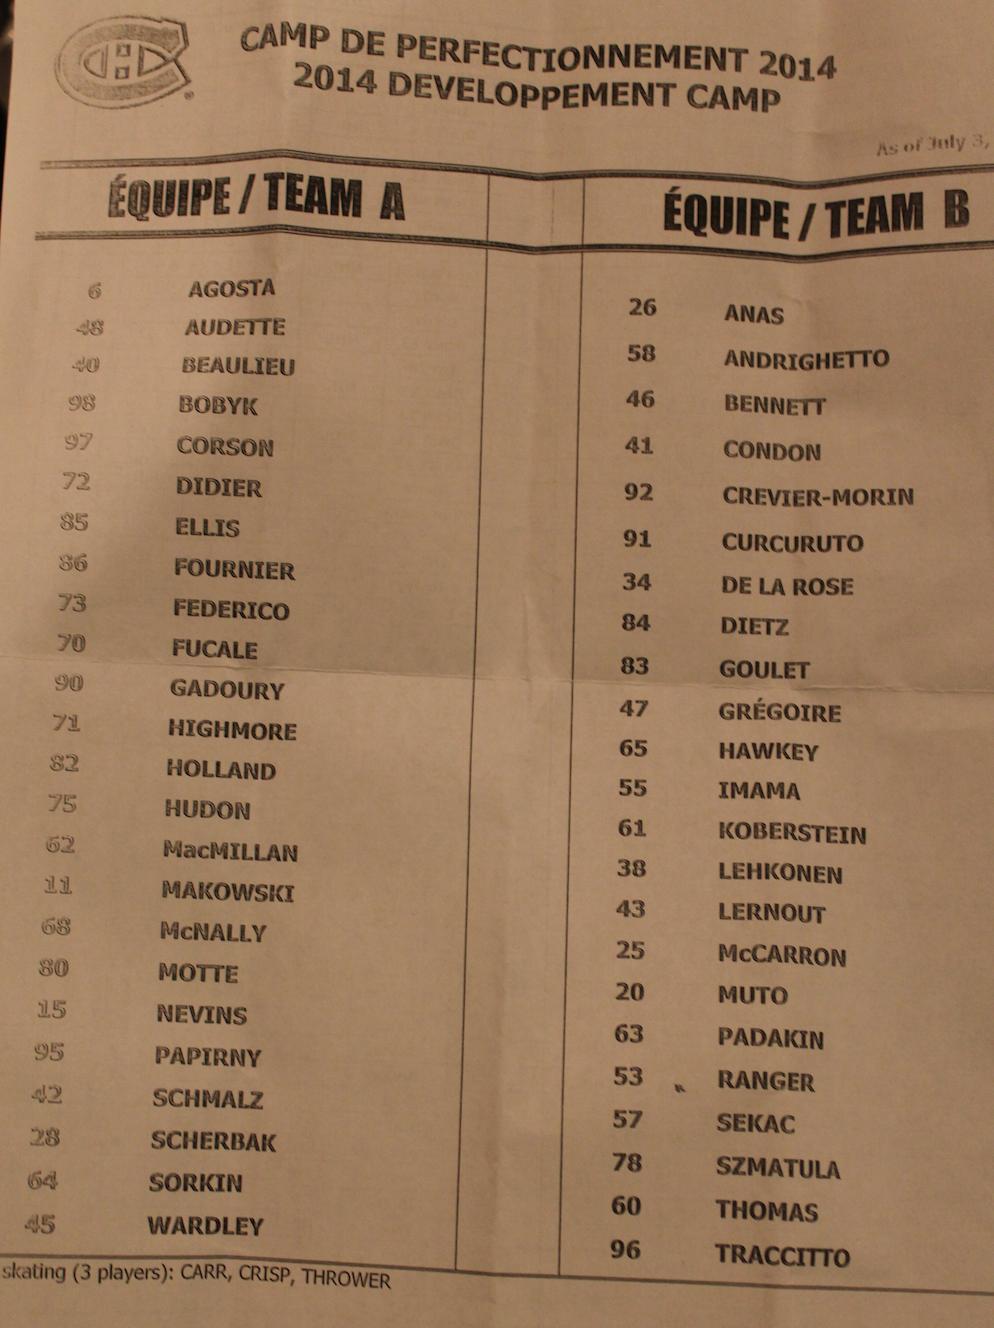 Team_a_vs_team_b